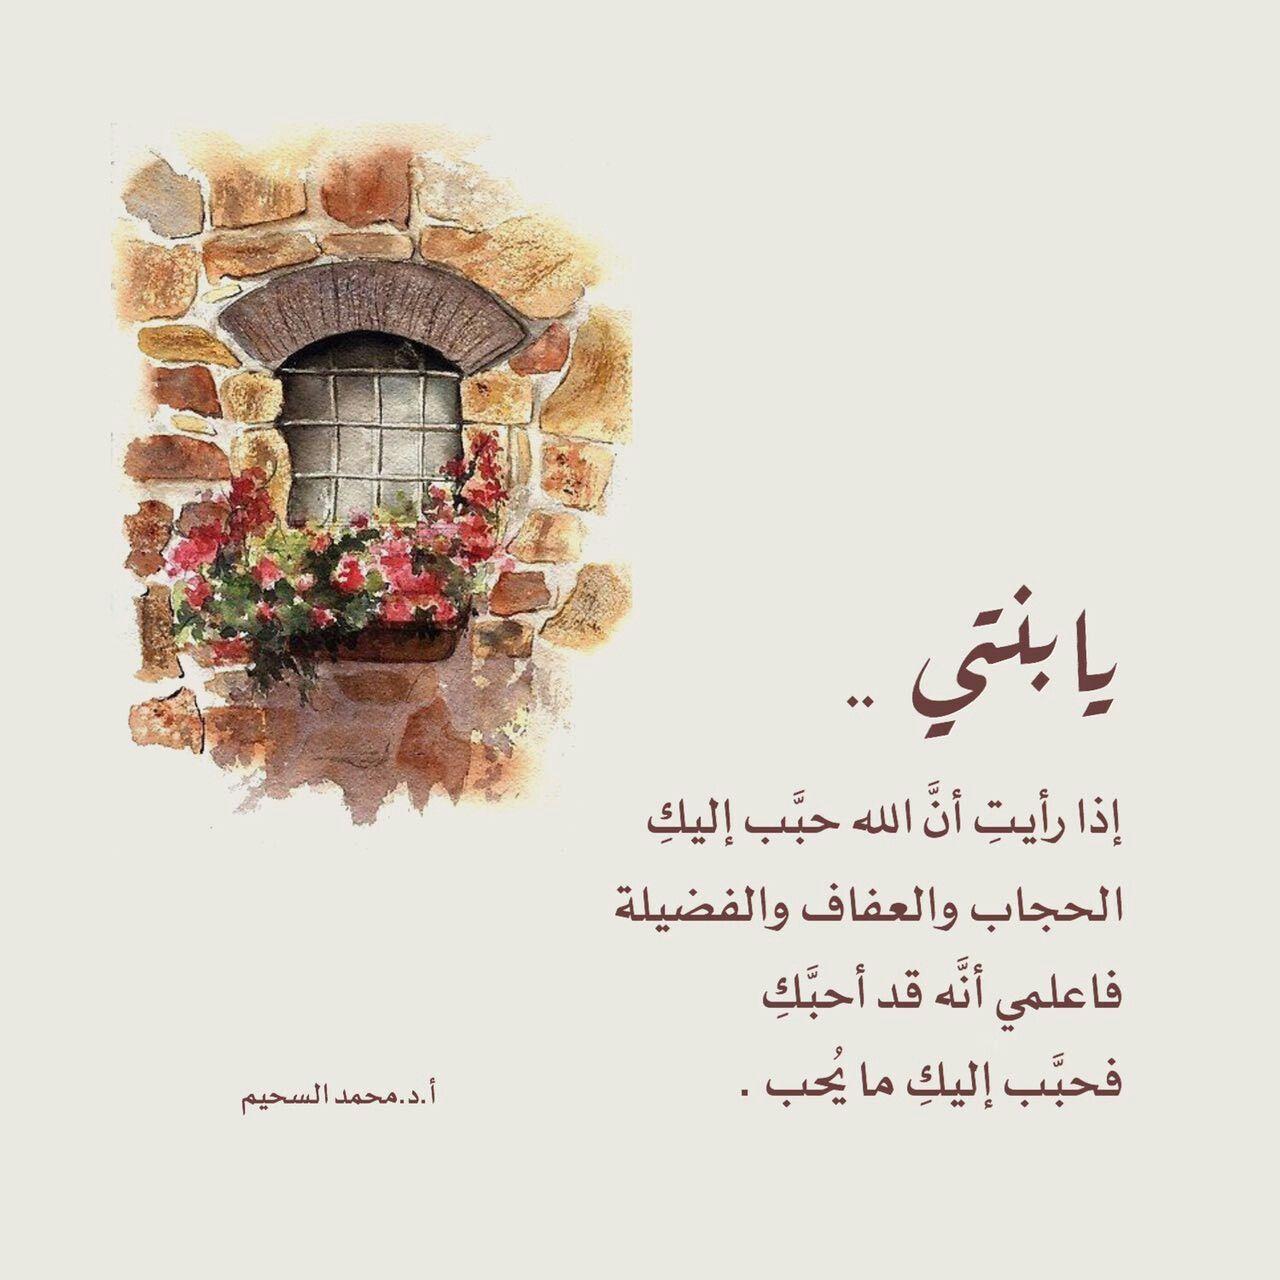 يا بنتي Quran Quotes Love Beautiful Quran Quotes Arabic Quotes